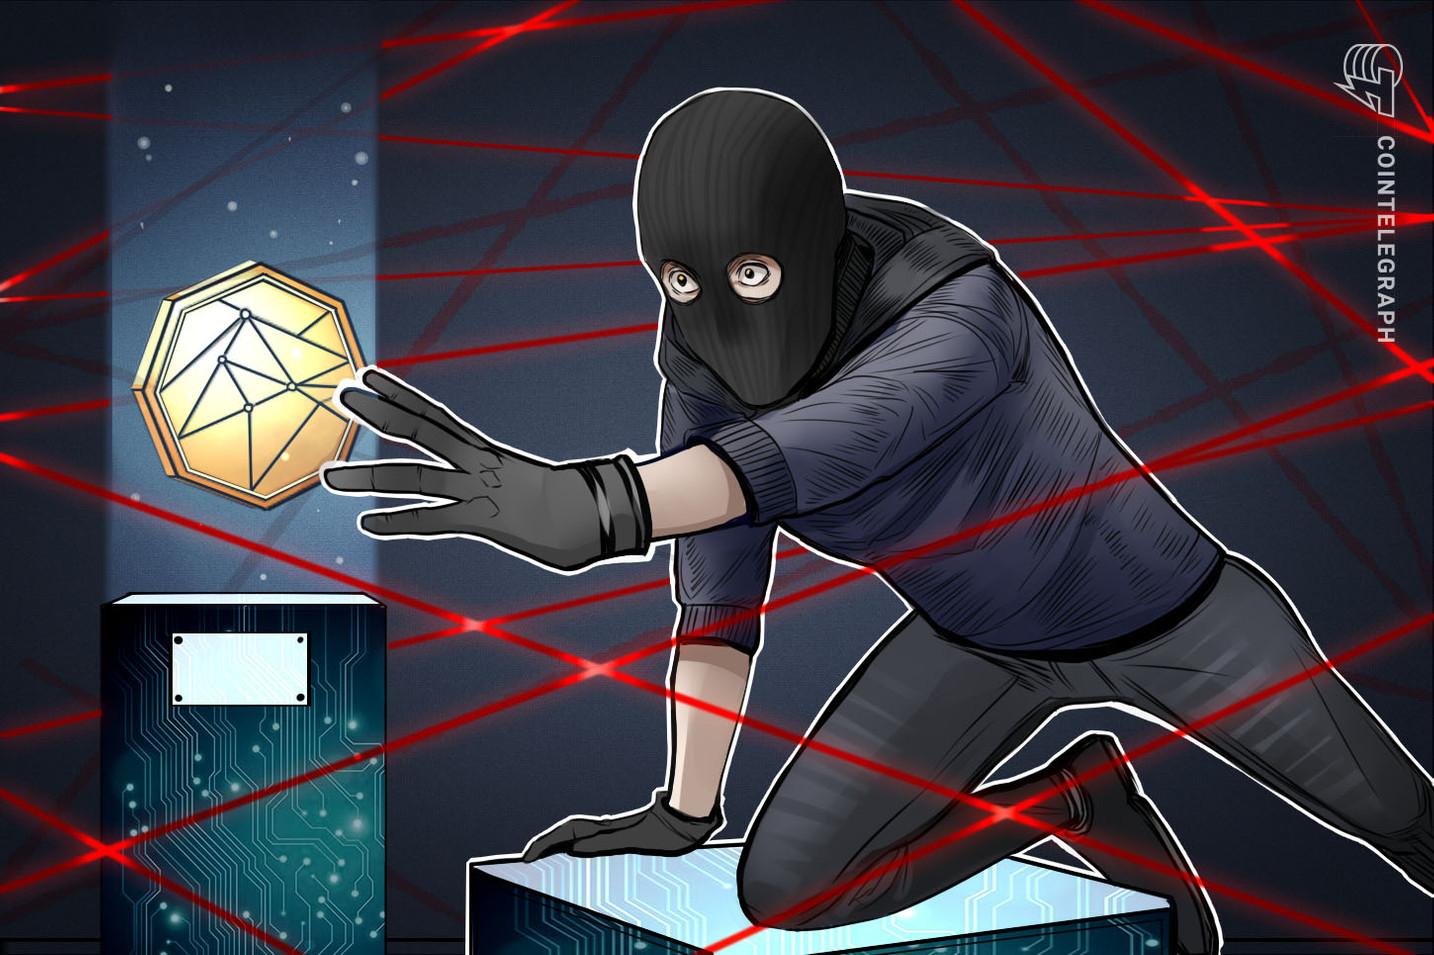 Zabu token price flatlines after $3.2M attack on Avalanche blockchain